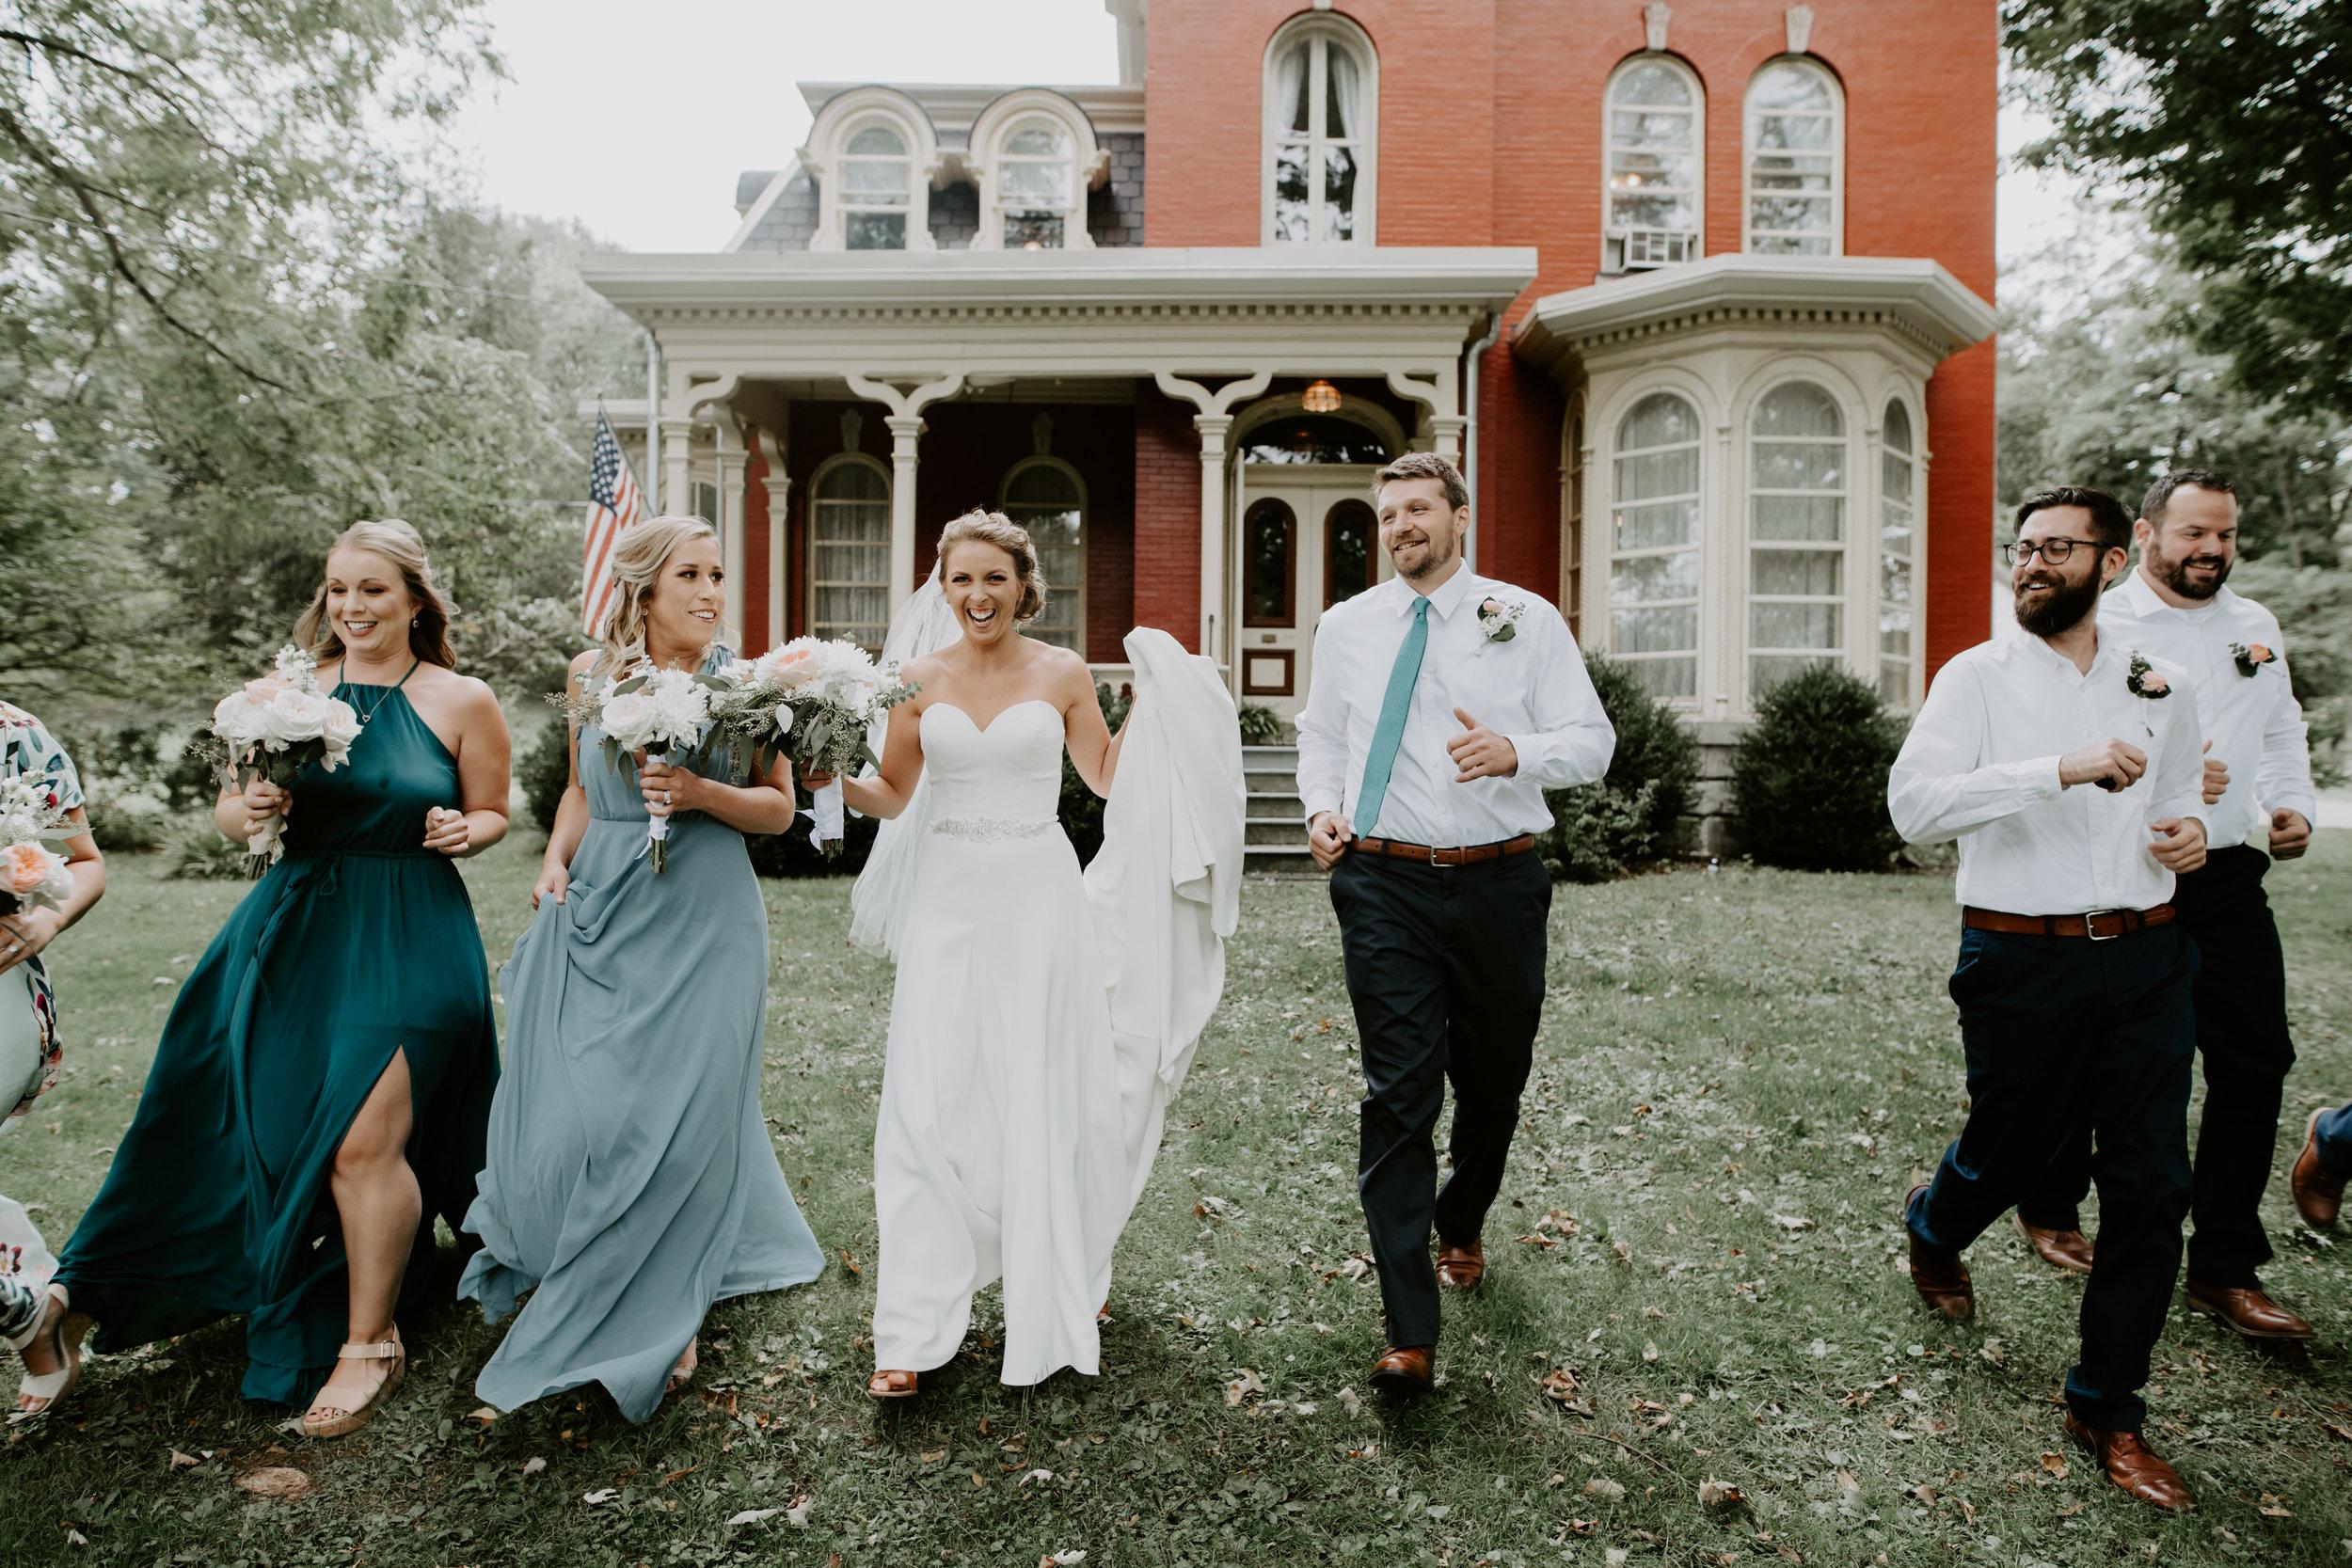 APD_chris_justin_wedding-257 copy.jpg